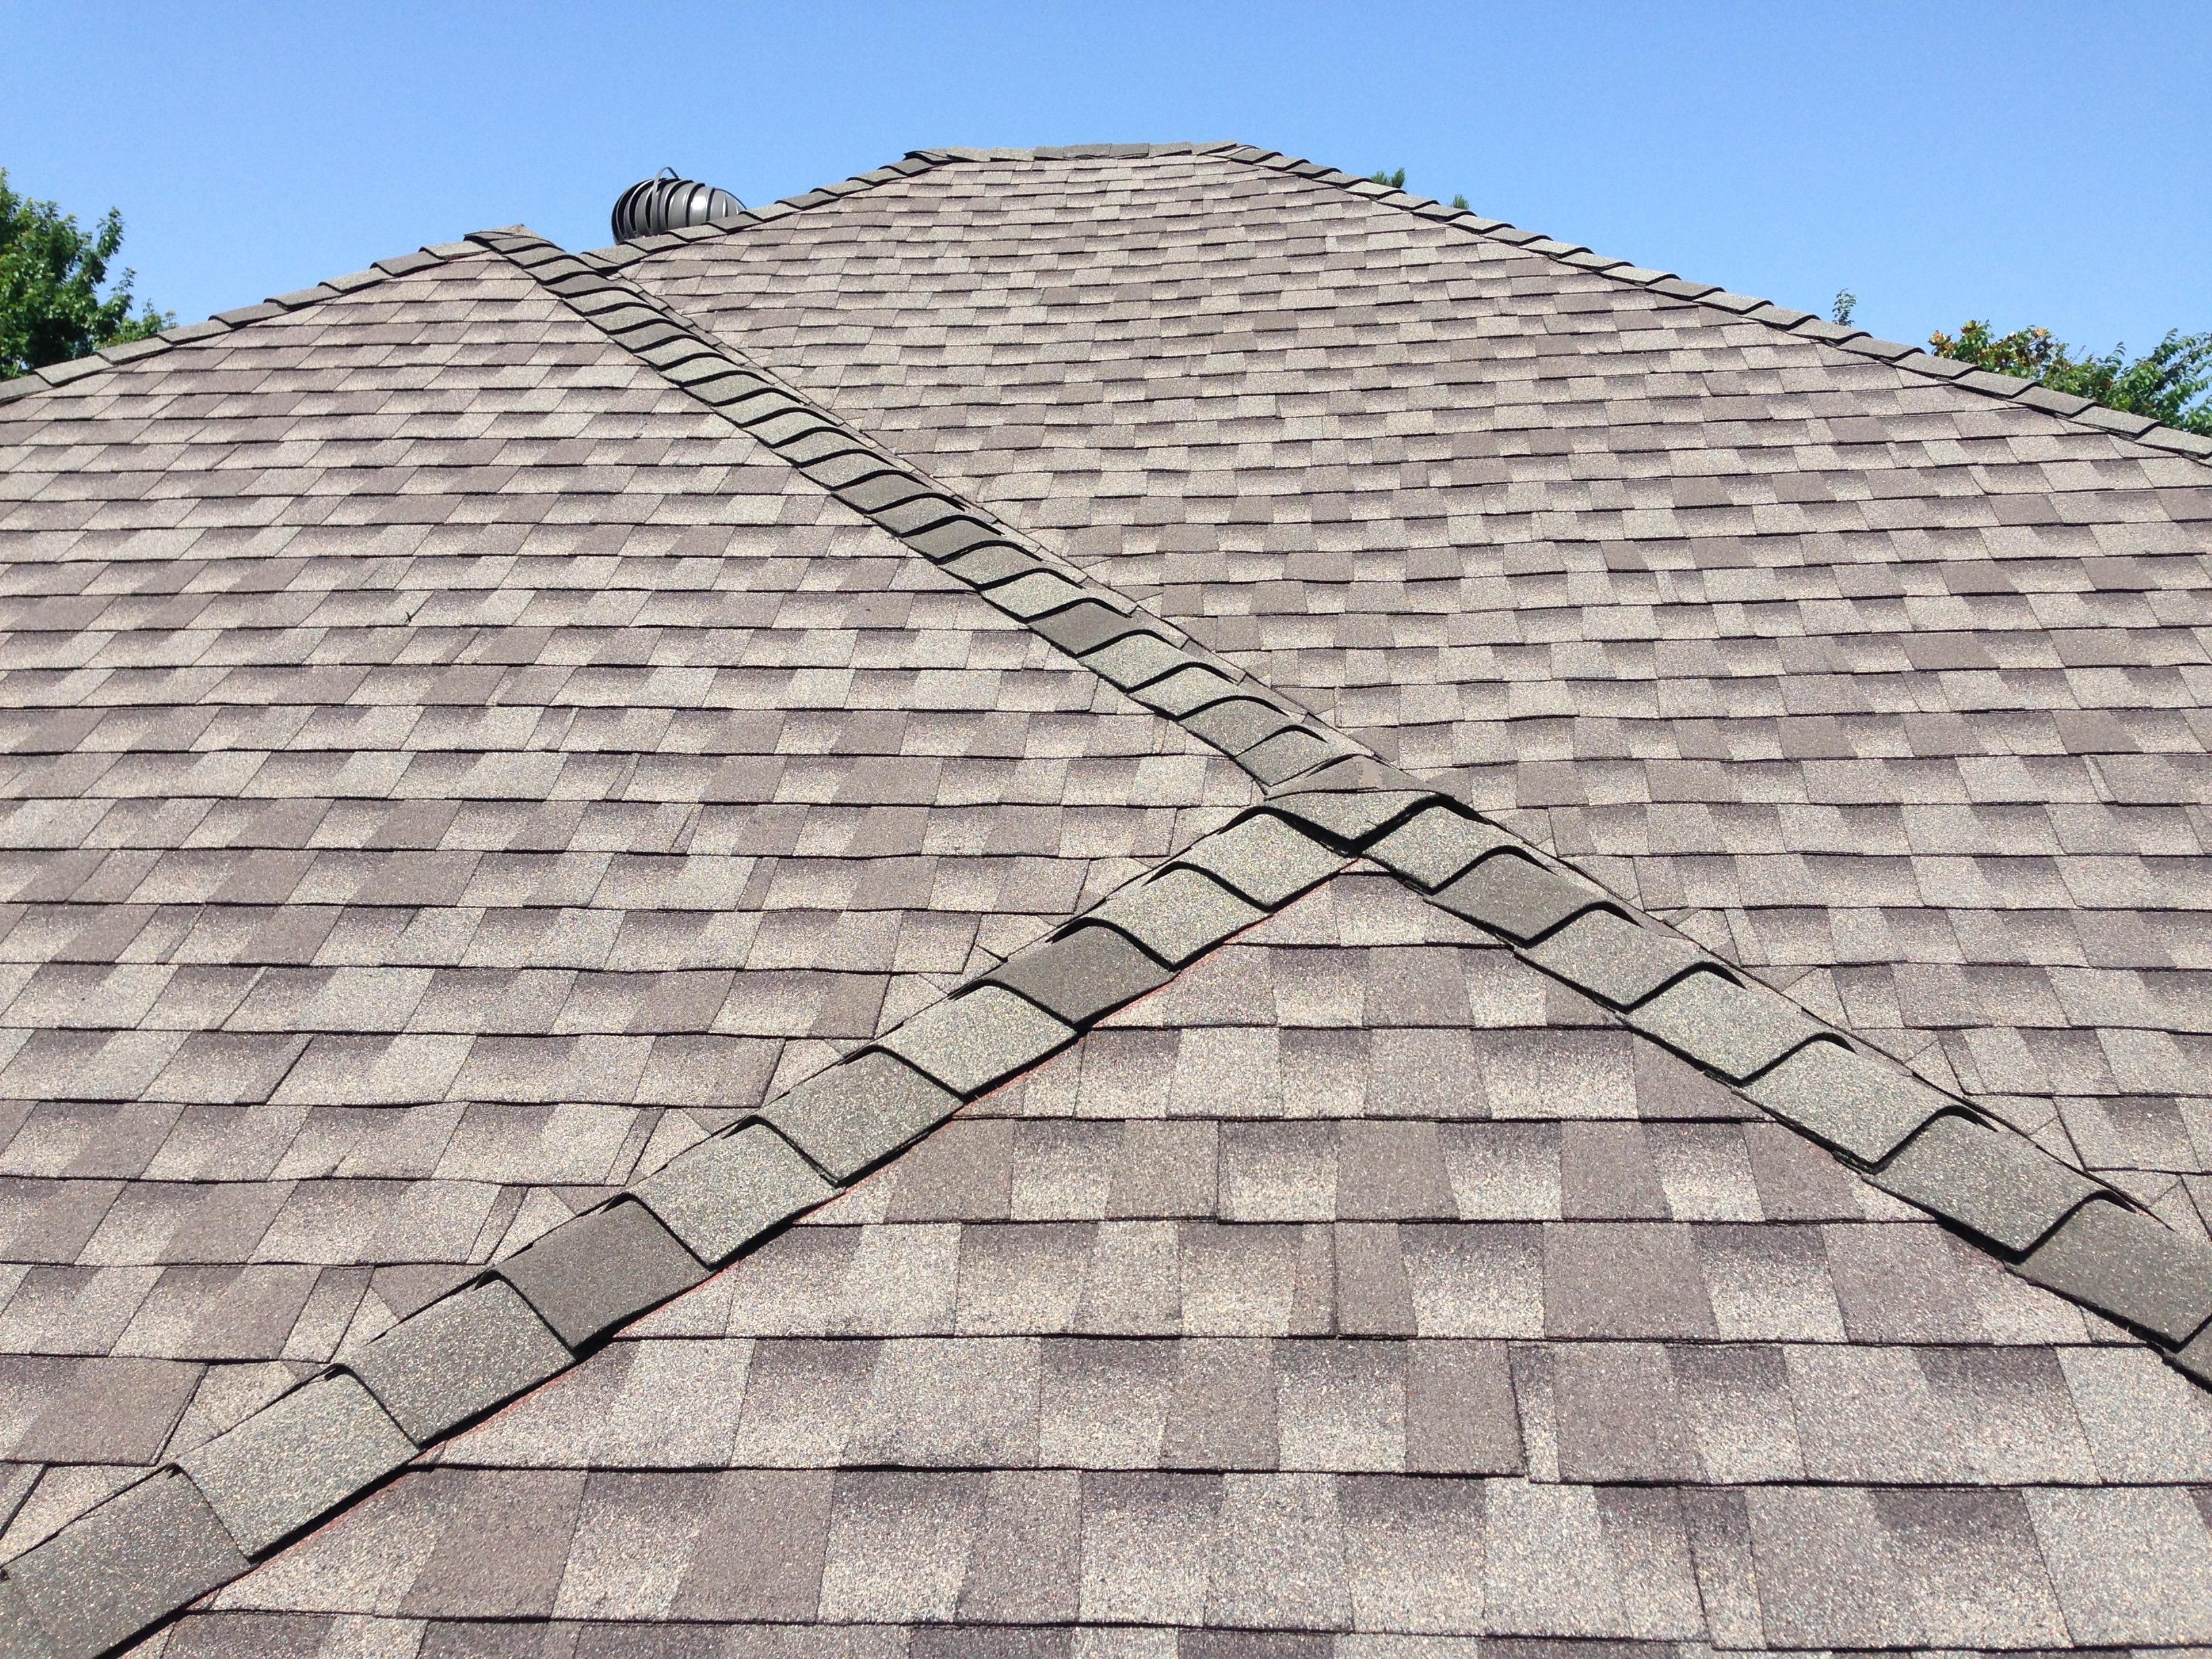 Texan Roofing image 2